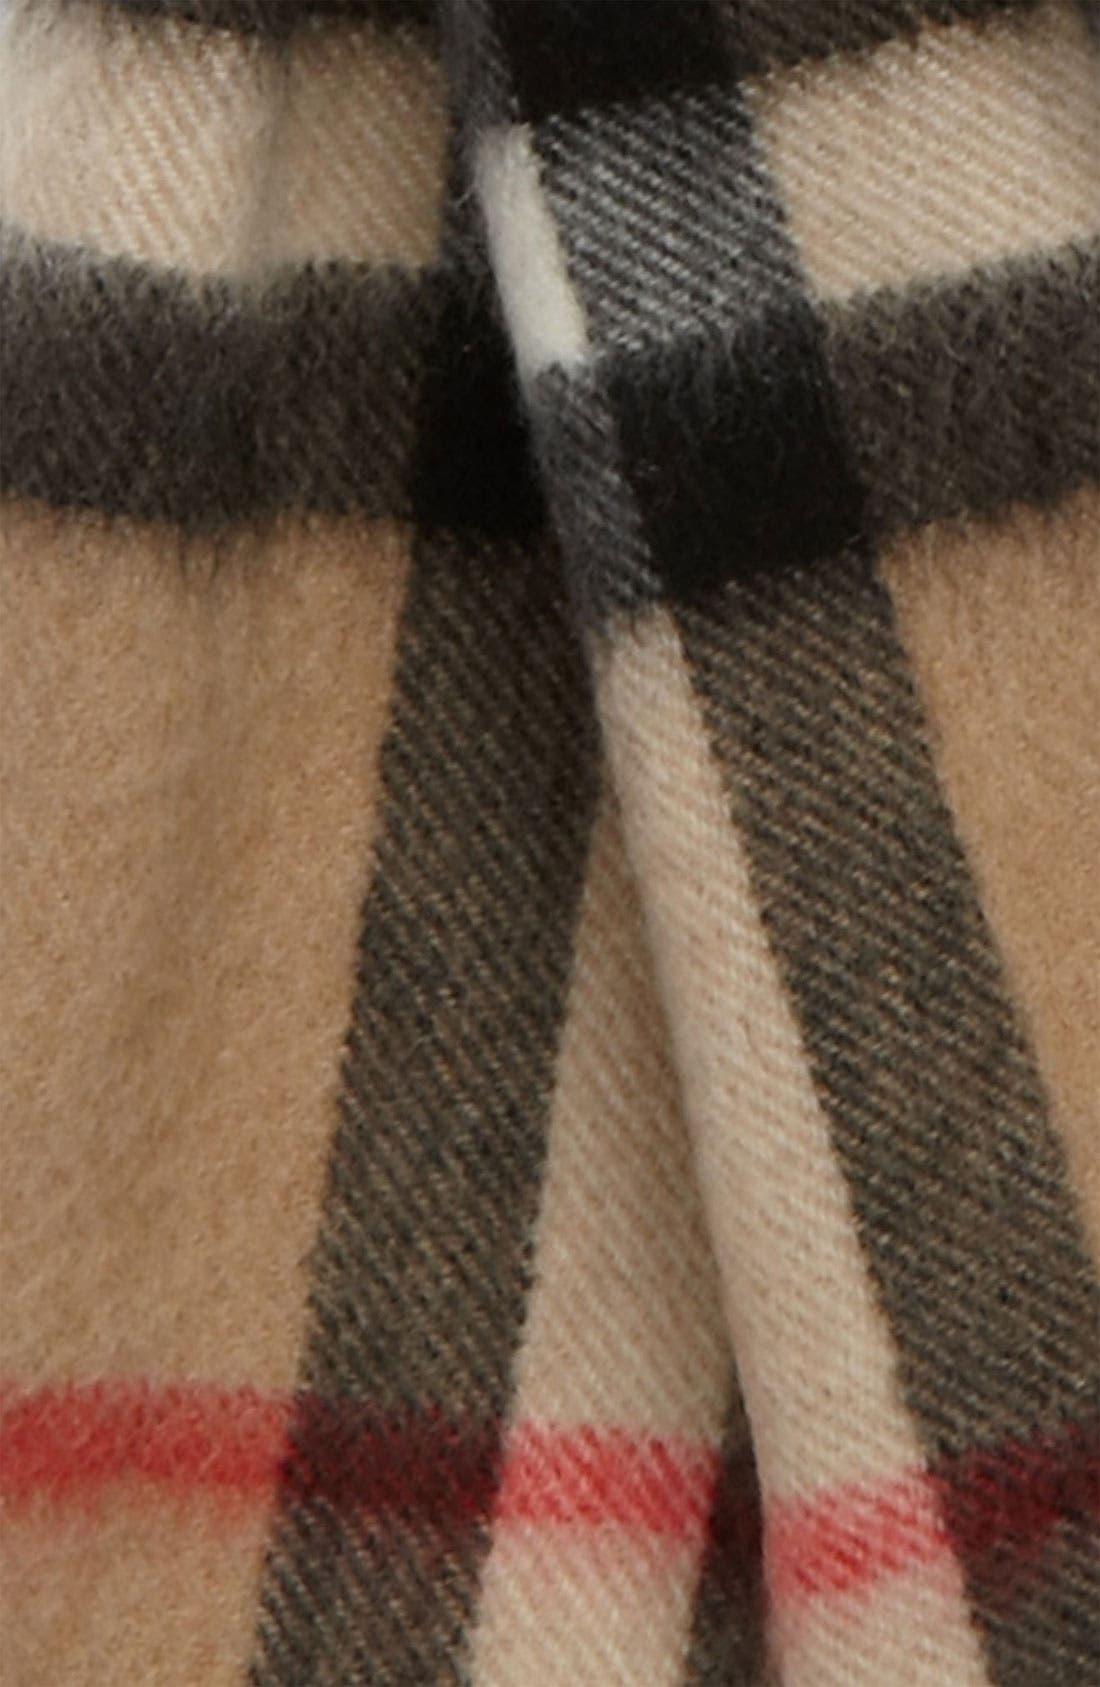 Alternate Image 2  - Burberry 'House Check' Cashmere Scarf (Girls)